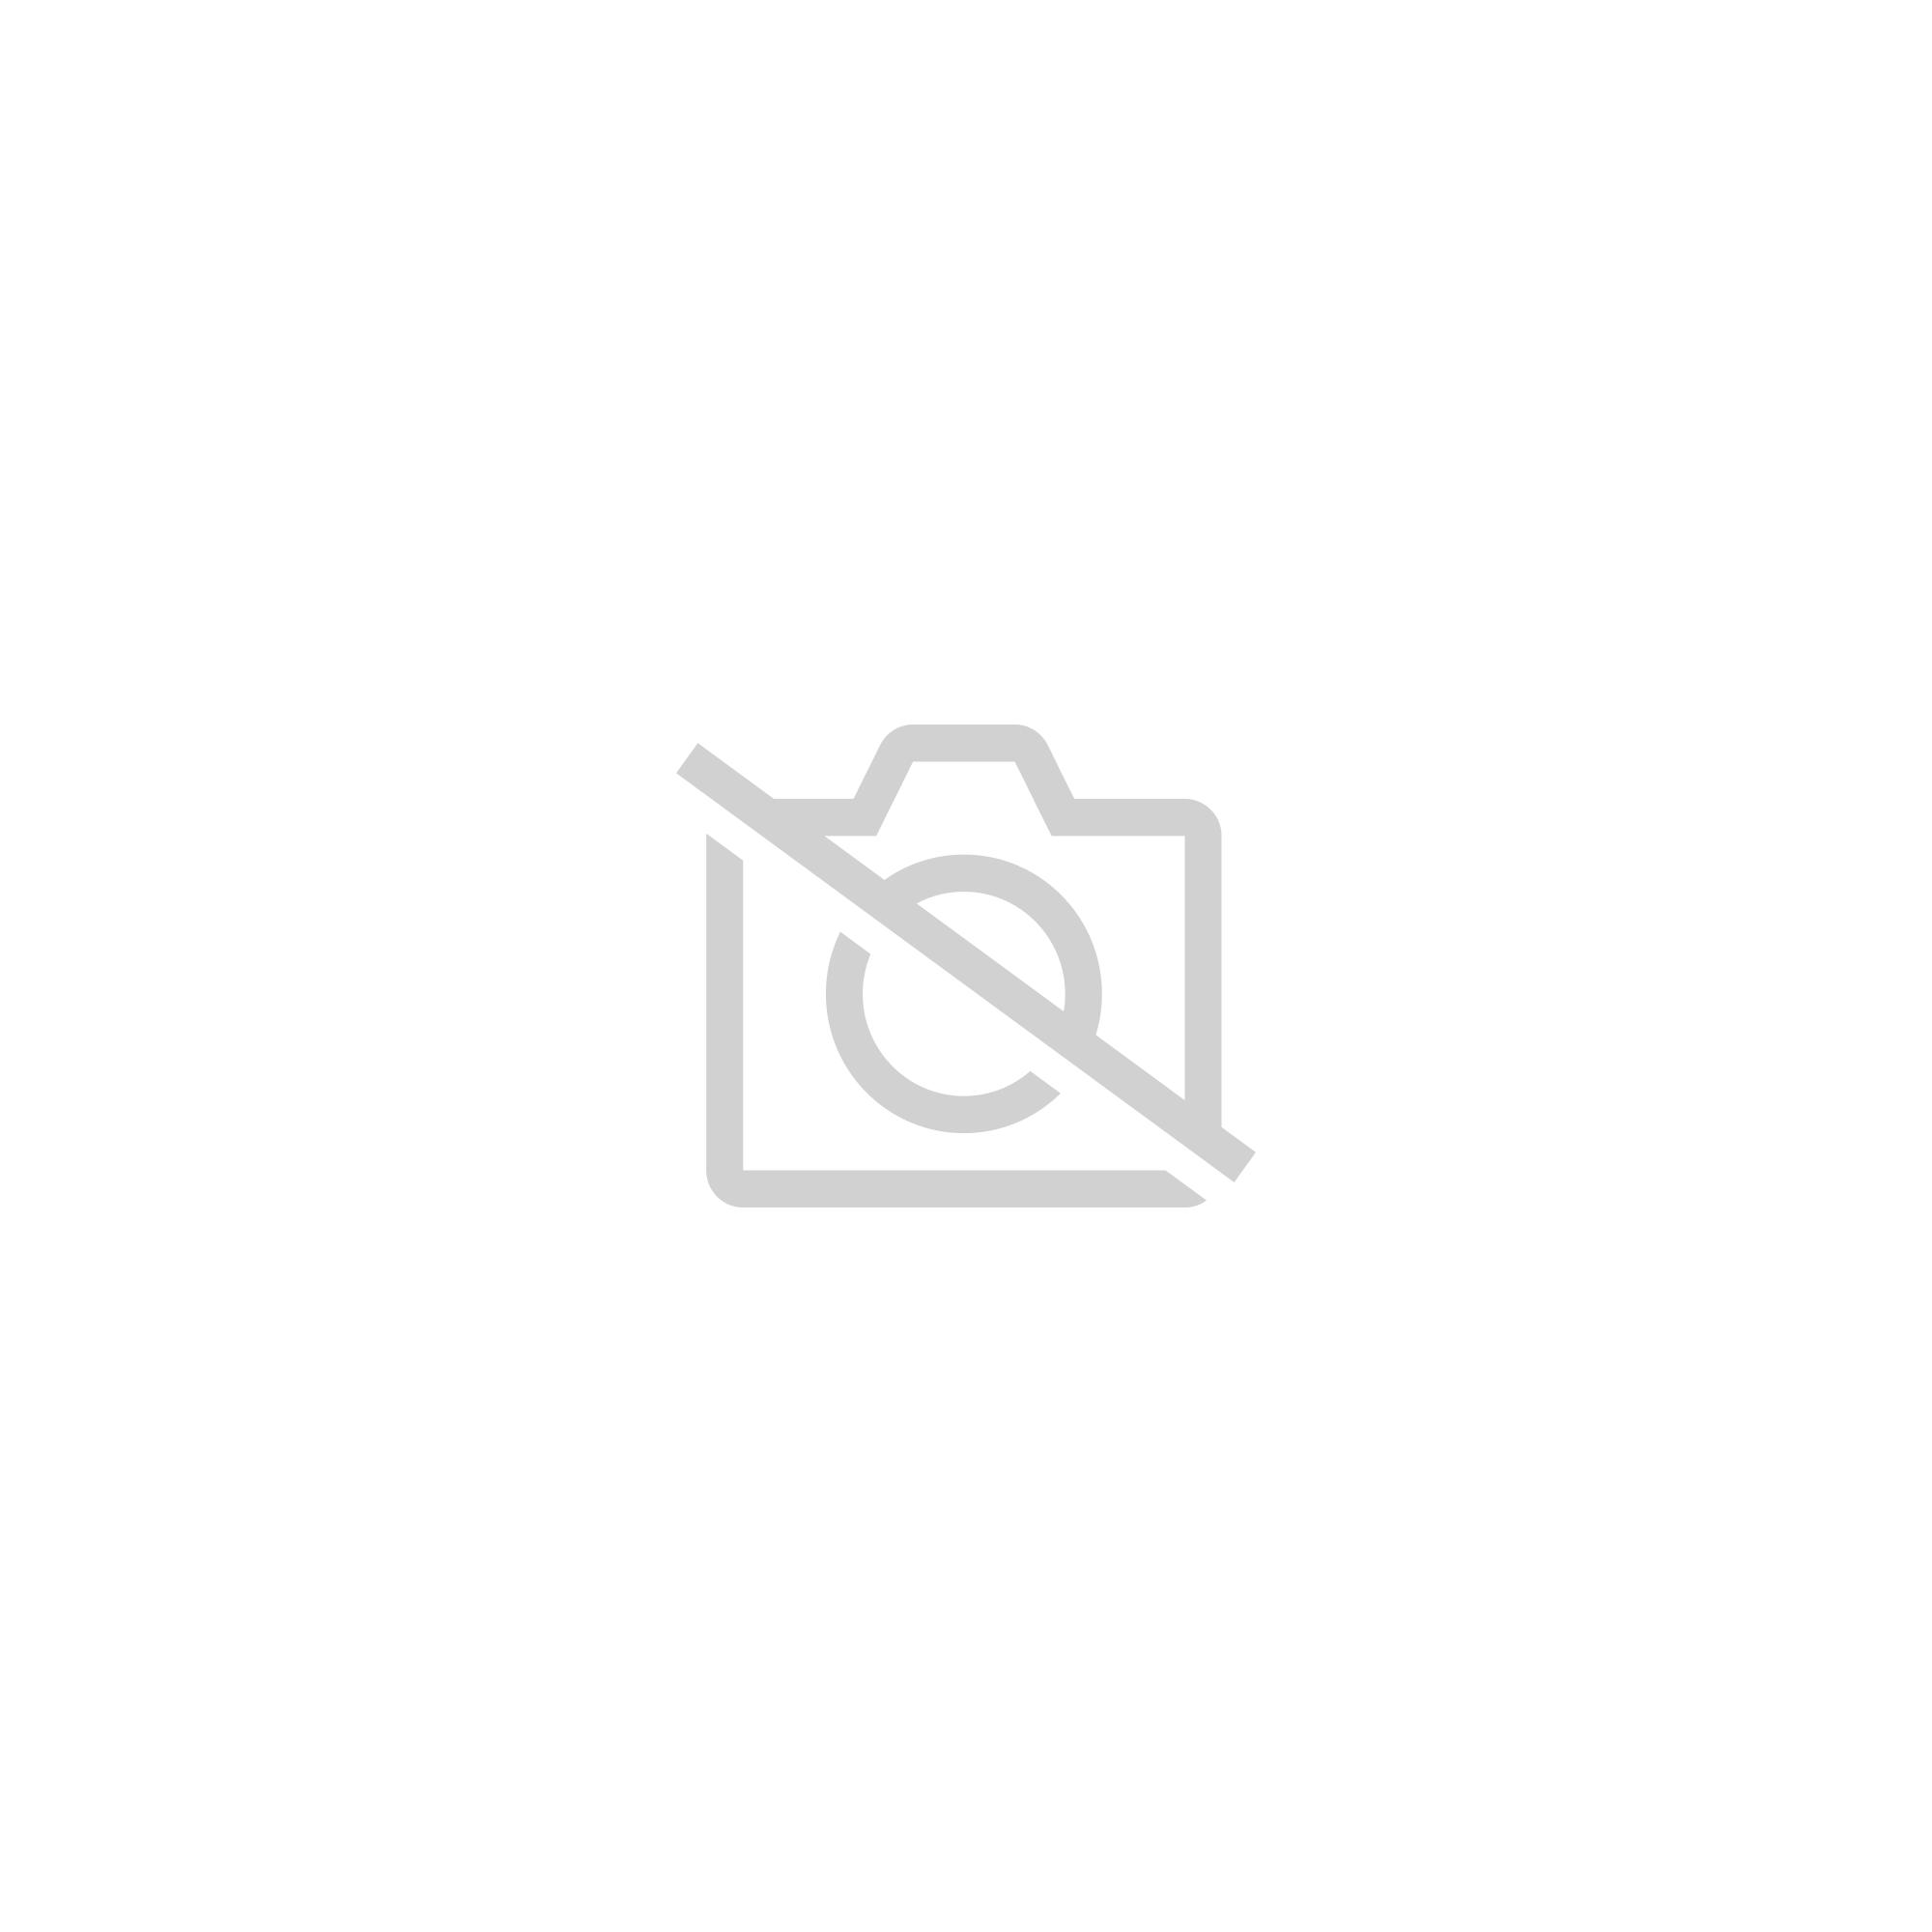 Housse Etui Coque Rouge Pour Samsung Galaxy S2 I9100 + Film